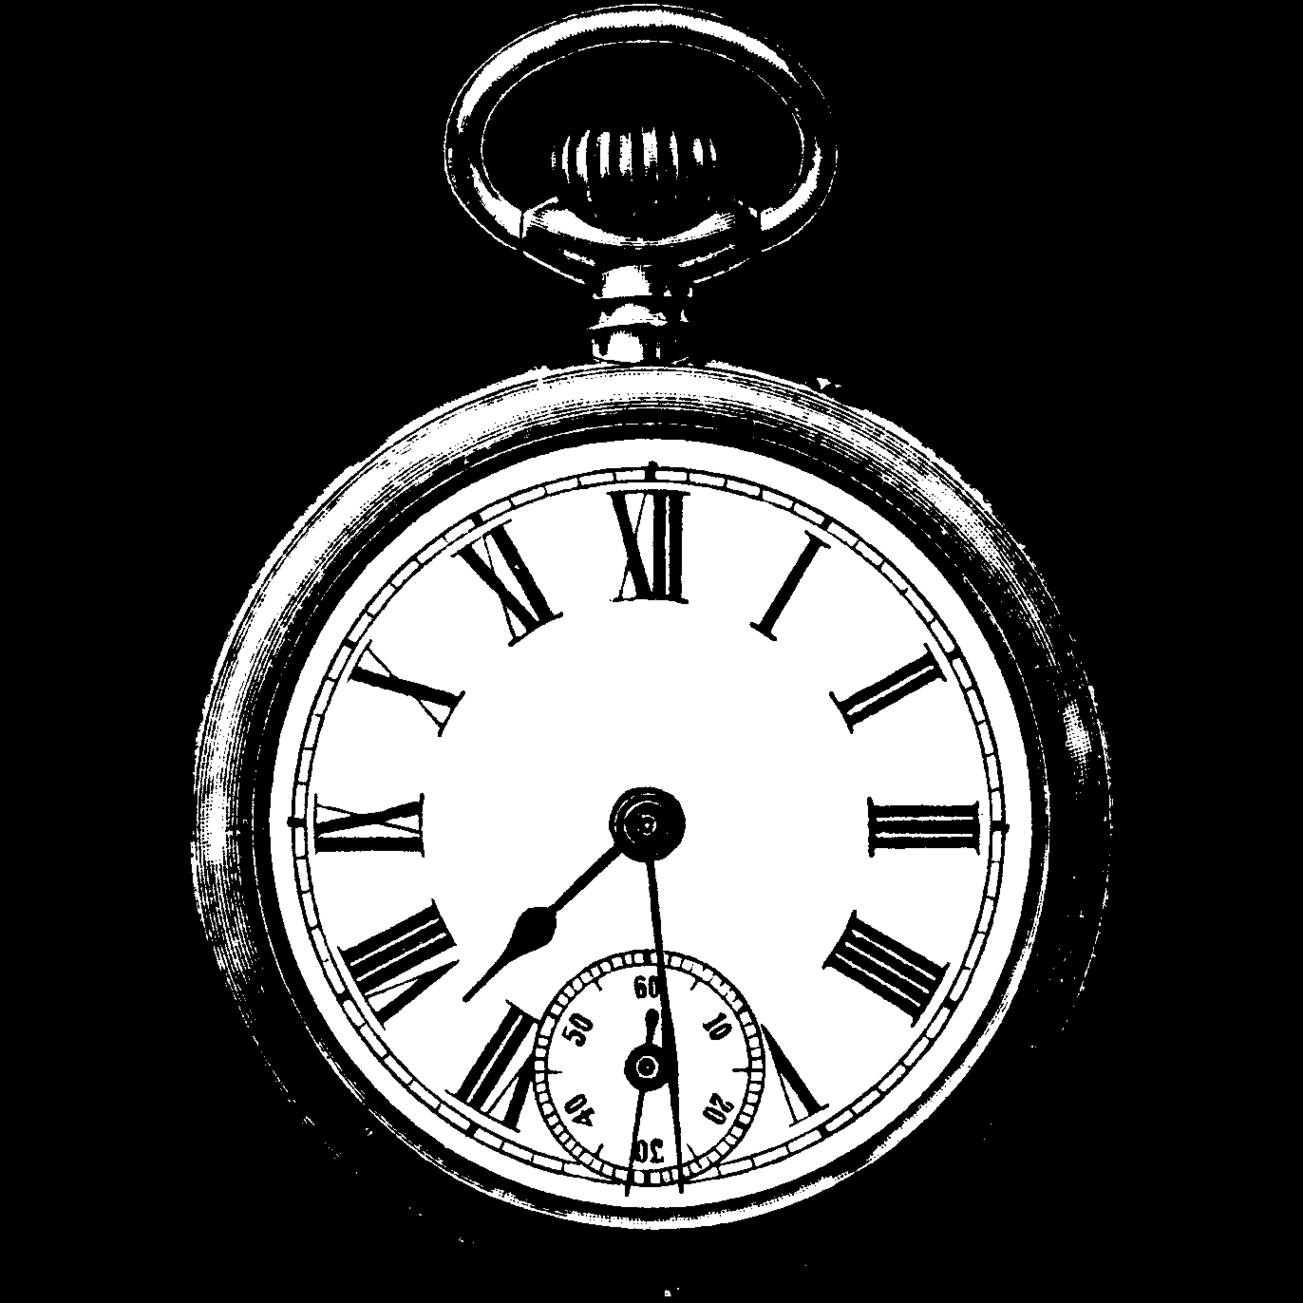 1303x1303 Clock Interesting Clock Drawing Test Design Clock Drawing Test